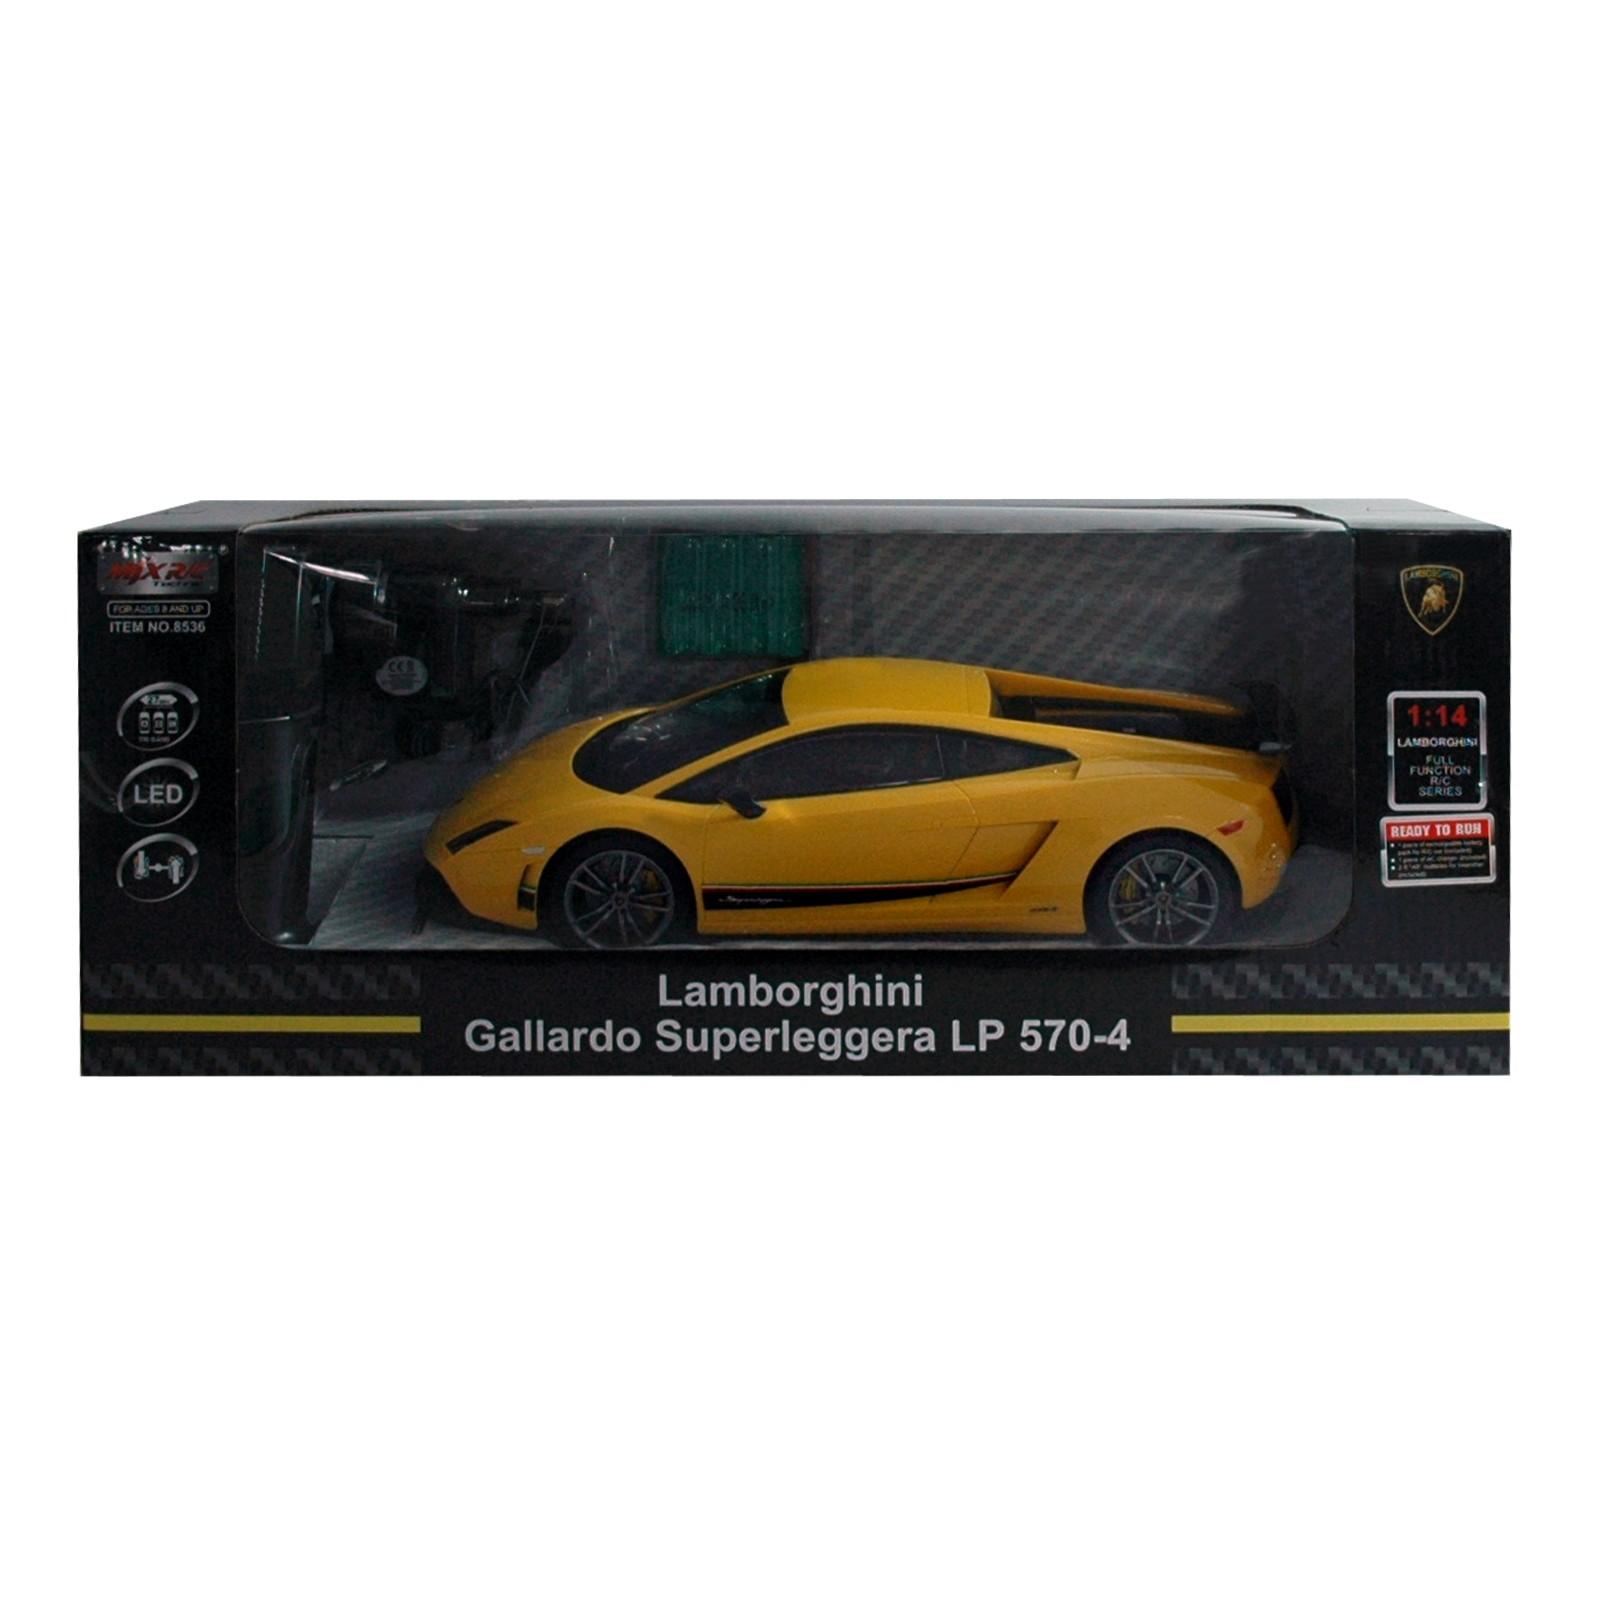 RC Lamborghini Gallardo Superleggera, gelb Pistolen Fernbedienung